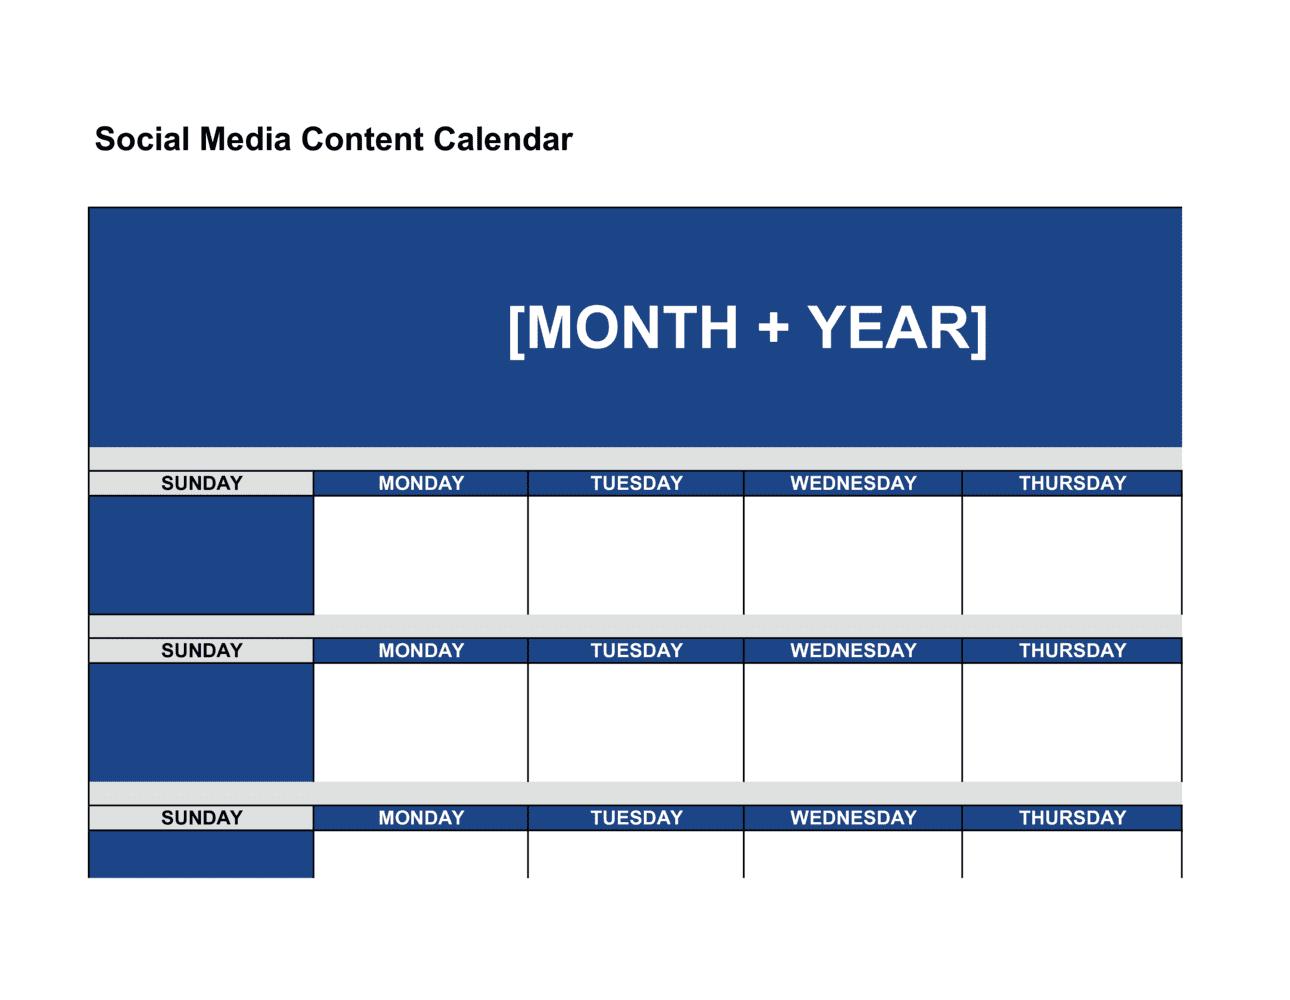 Business-in-a-Box's Social Media Content Calendar Template